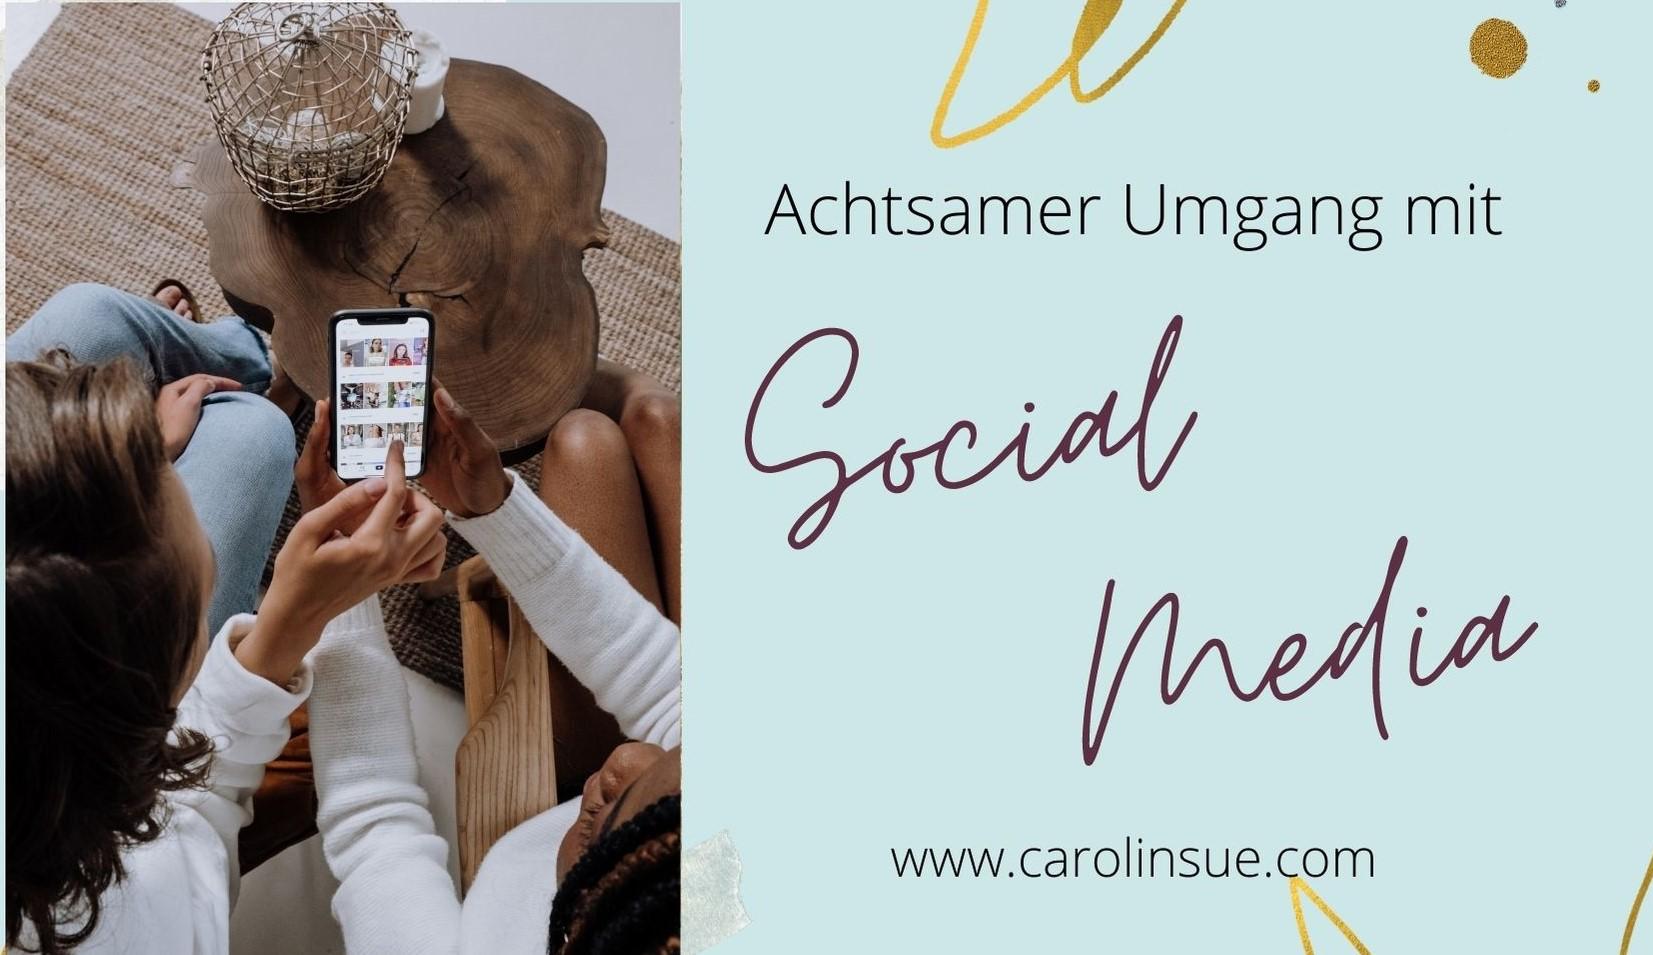 6 wichtige Schritte: Achtsamer Social Media Konsum